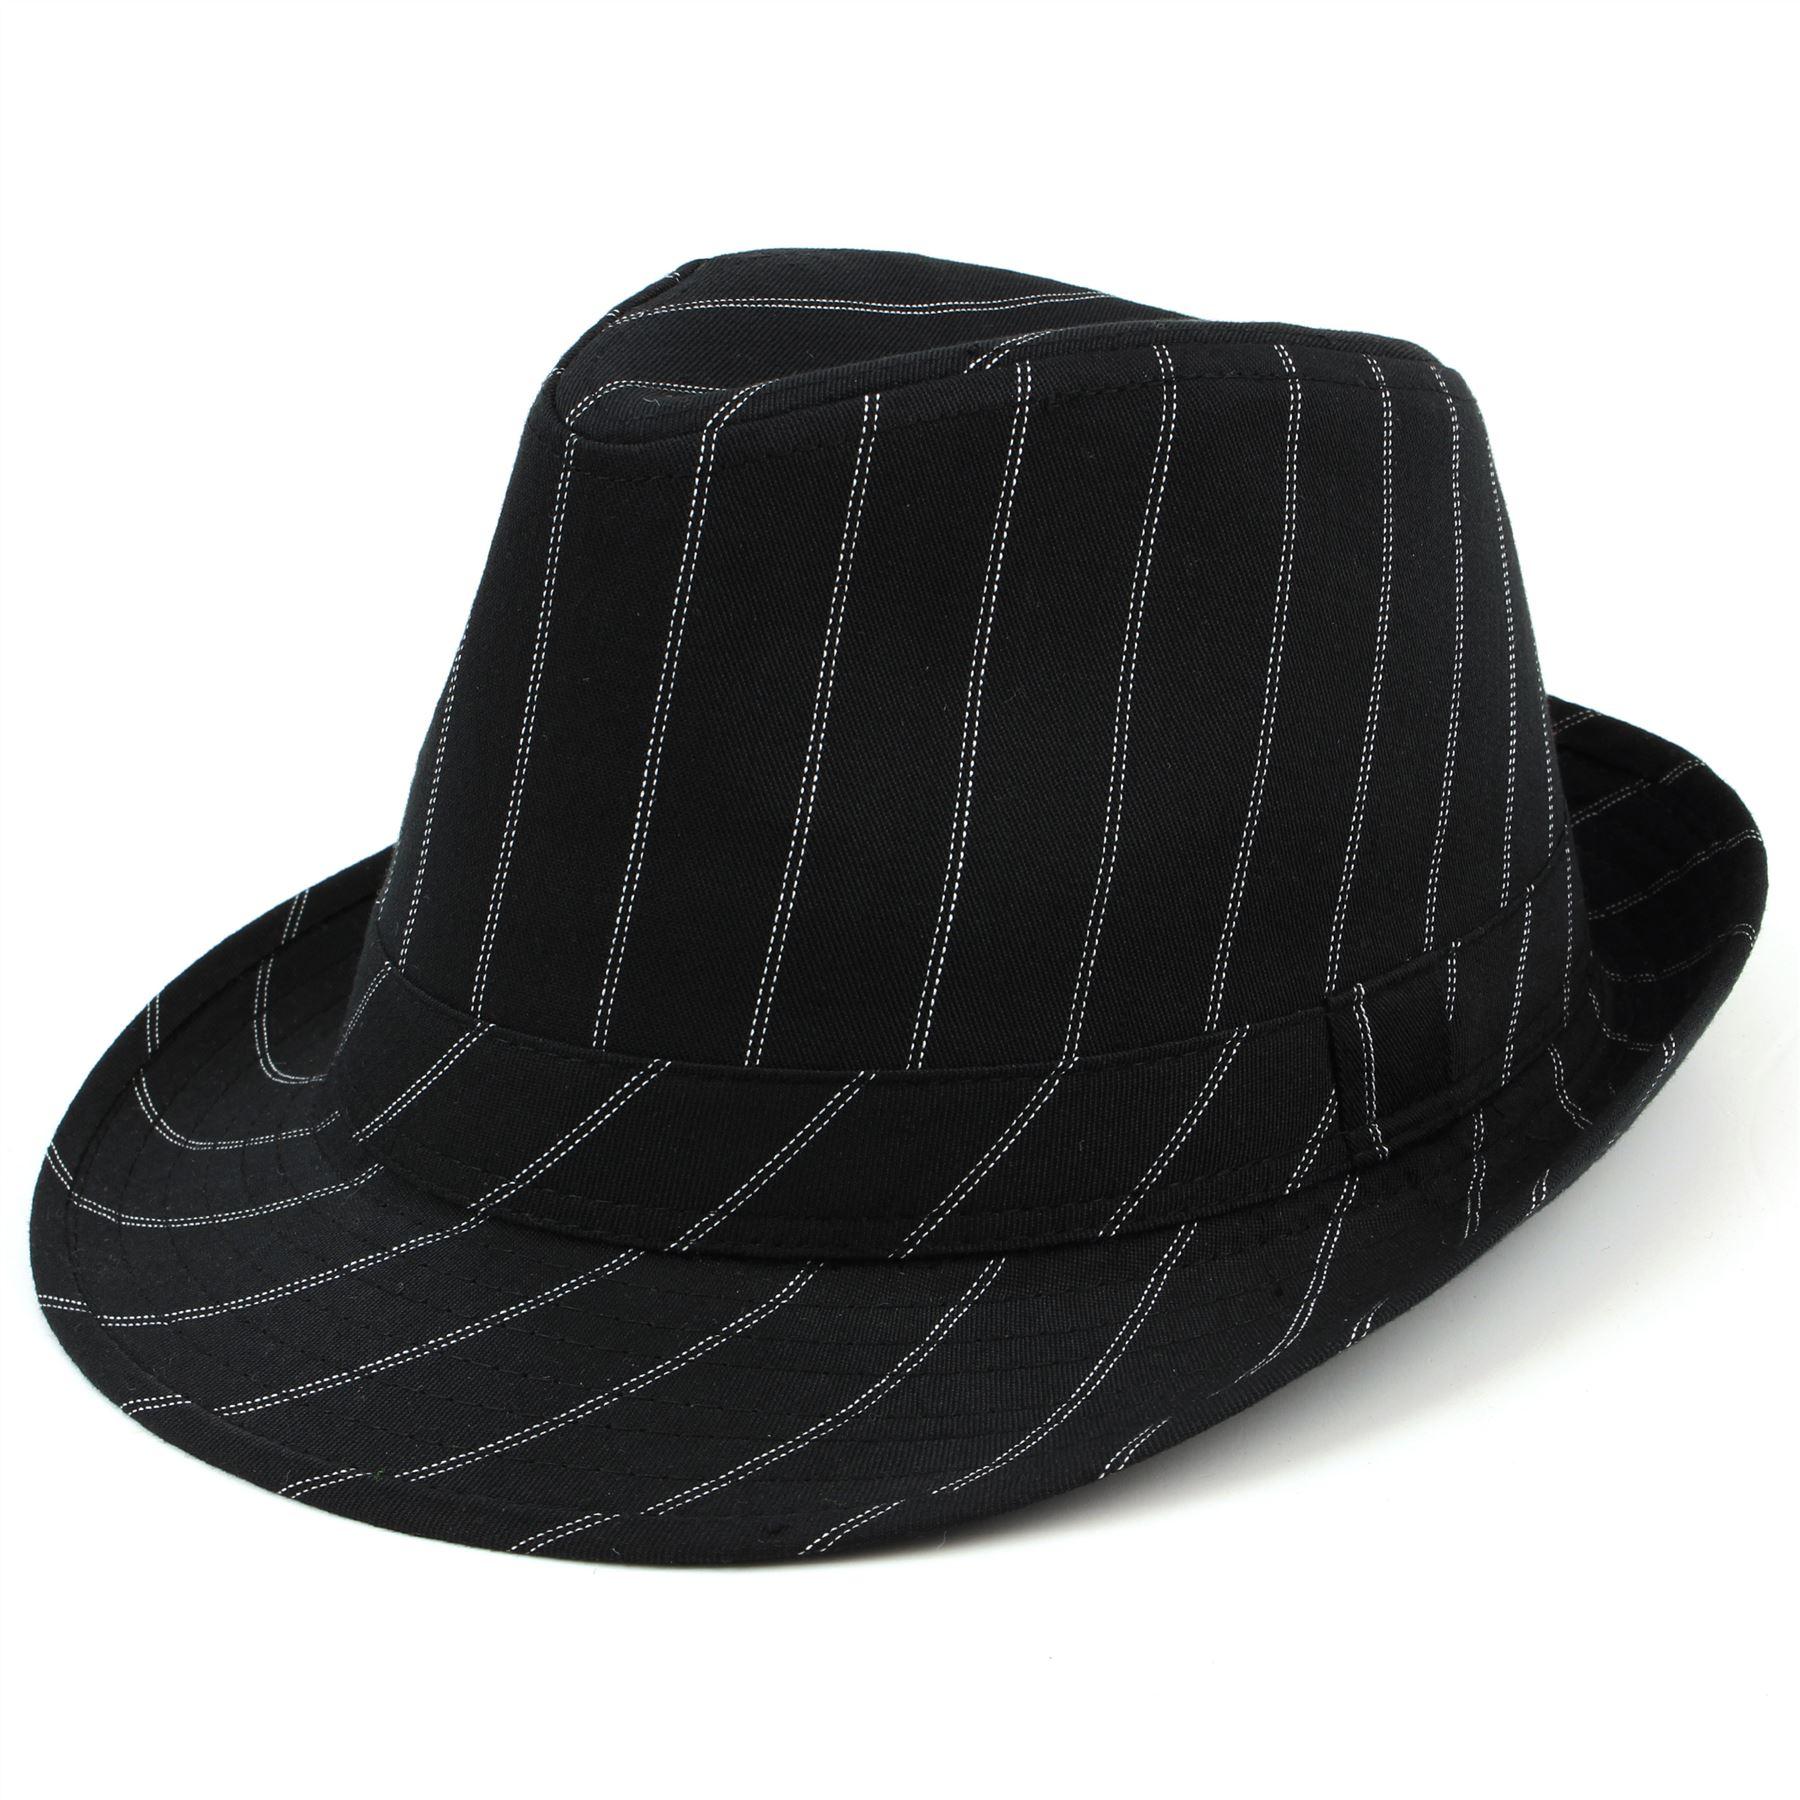 Details about Trilby Hat Pinstripe Fedora Panama Black Suit Ska Mens Formal  New Cap Man f88784f2c8b